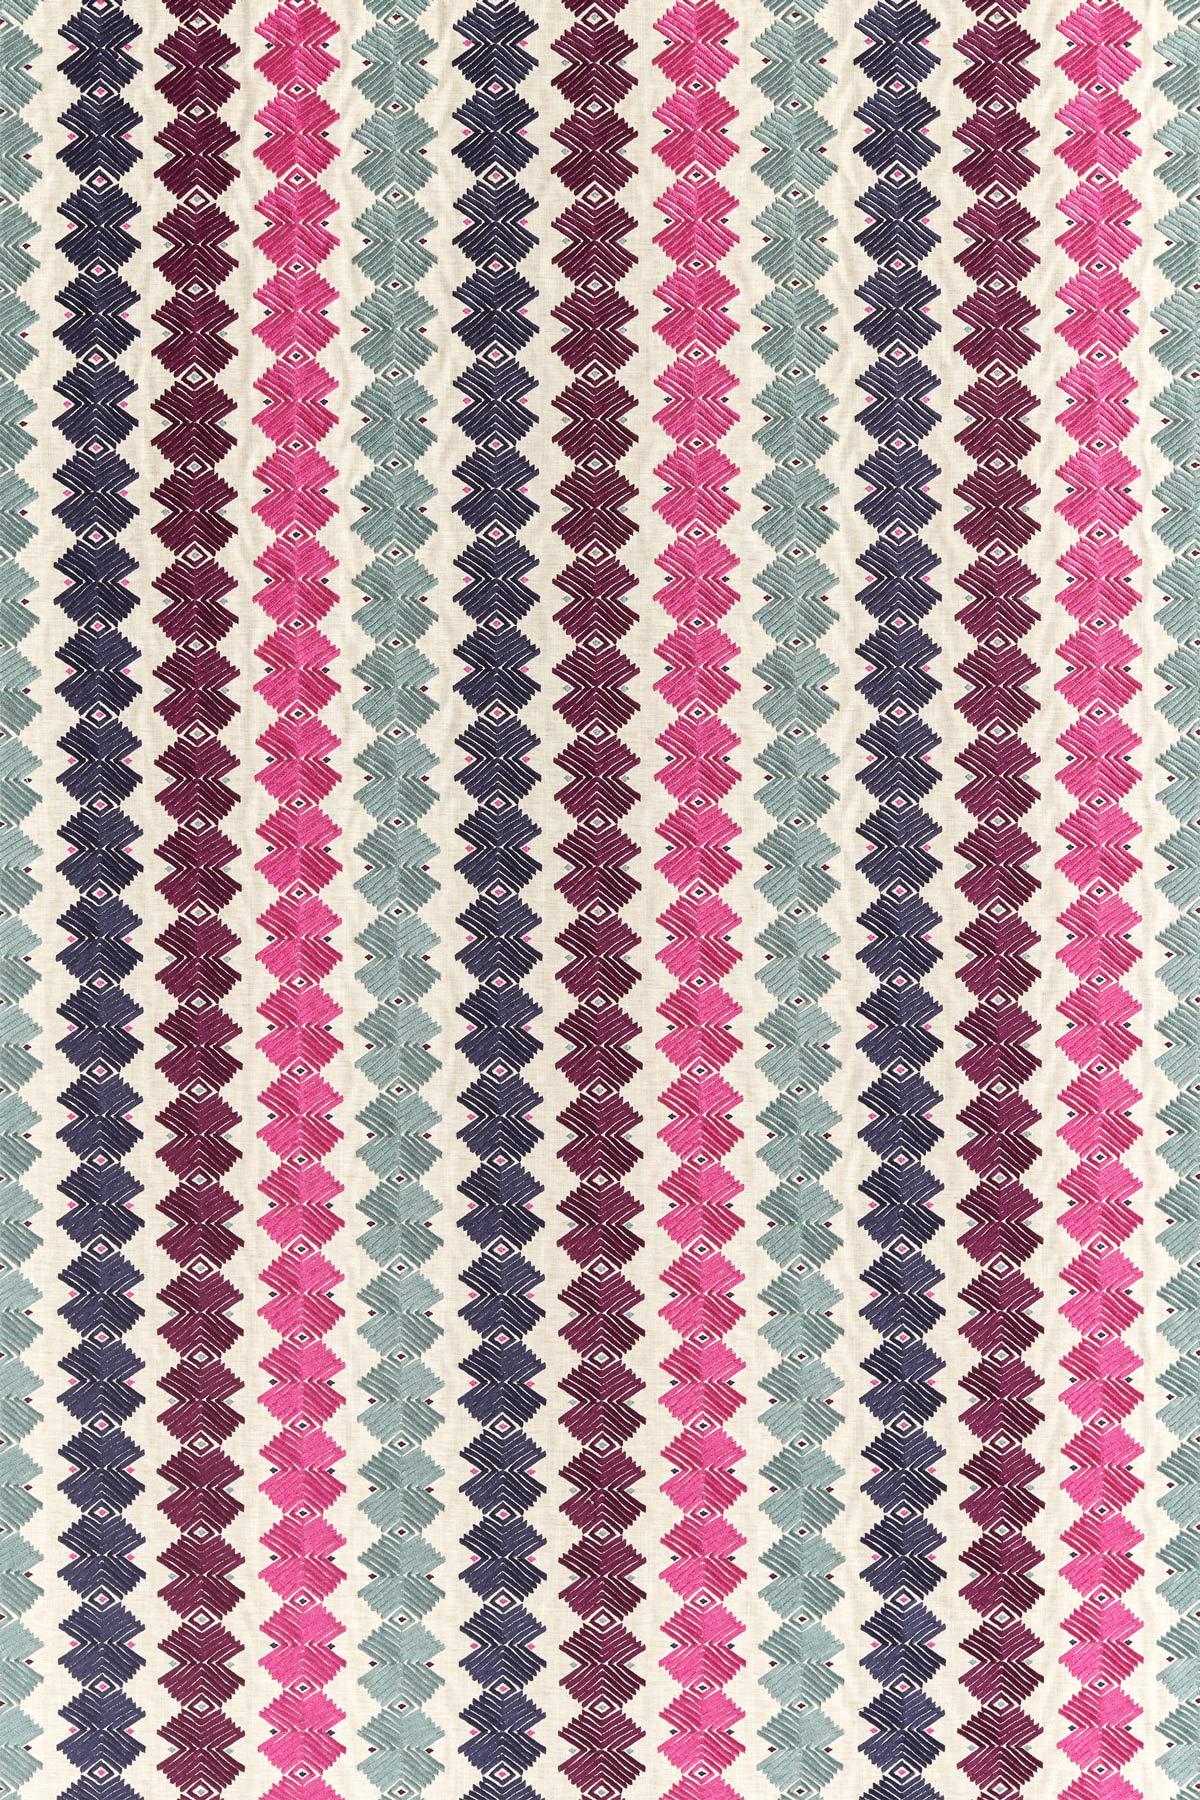 Kalimba Fabric - Seaglass / Cerise / Indigo - by Harlequin